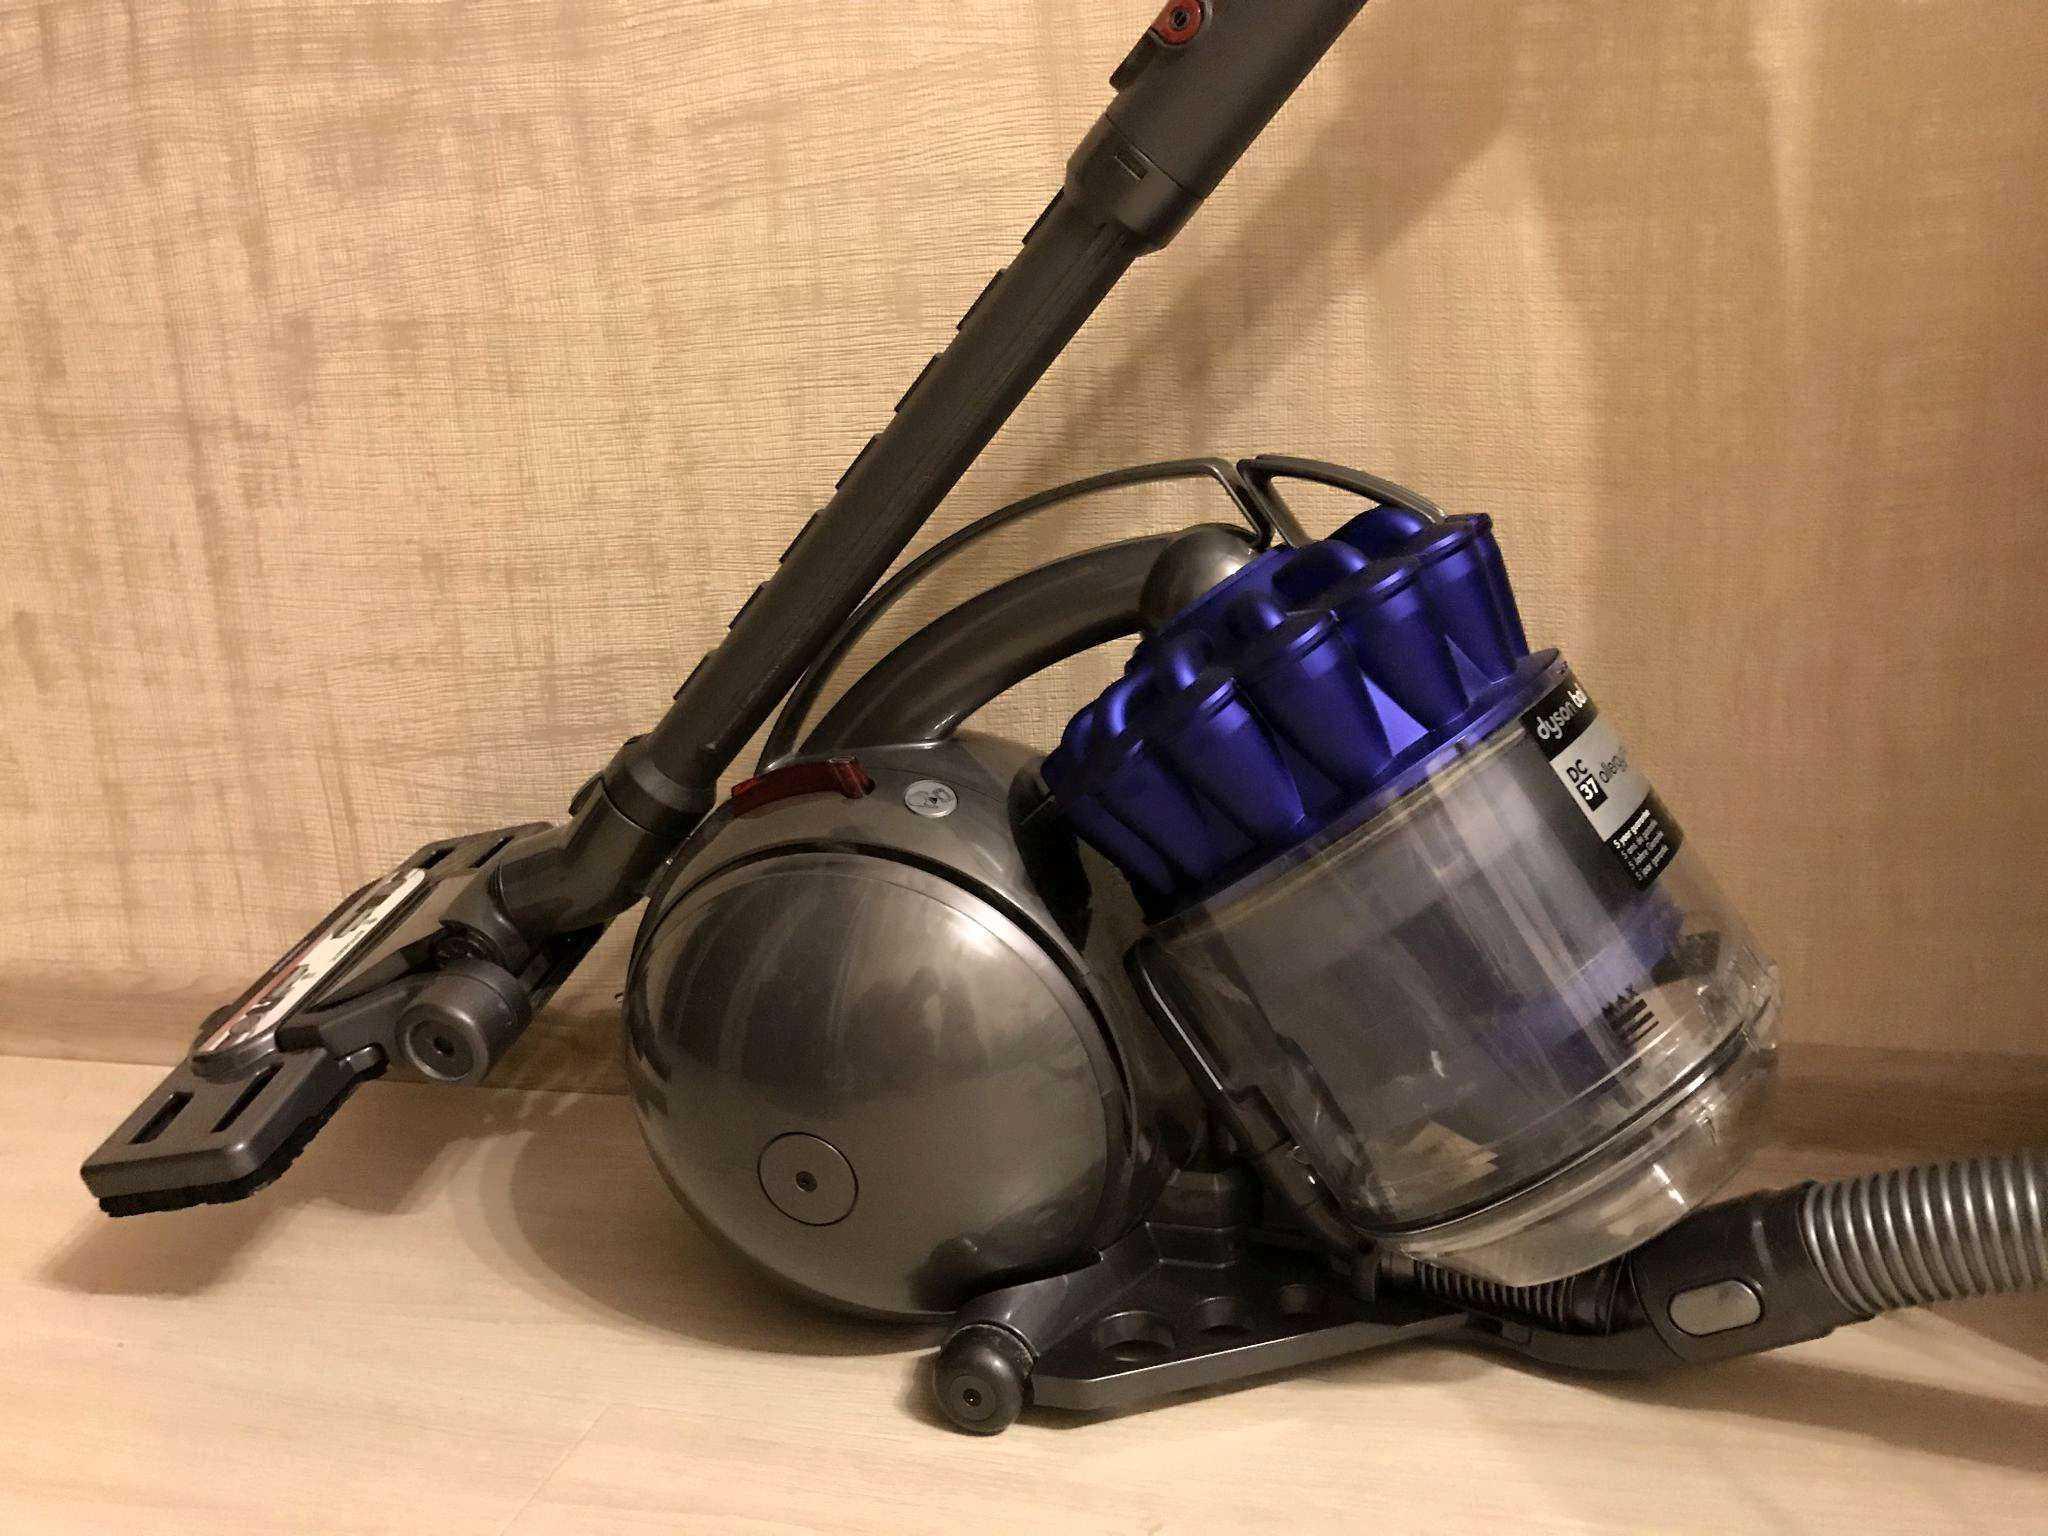 Dyson или аквафильтром dyson ball multi floor canister vacuum